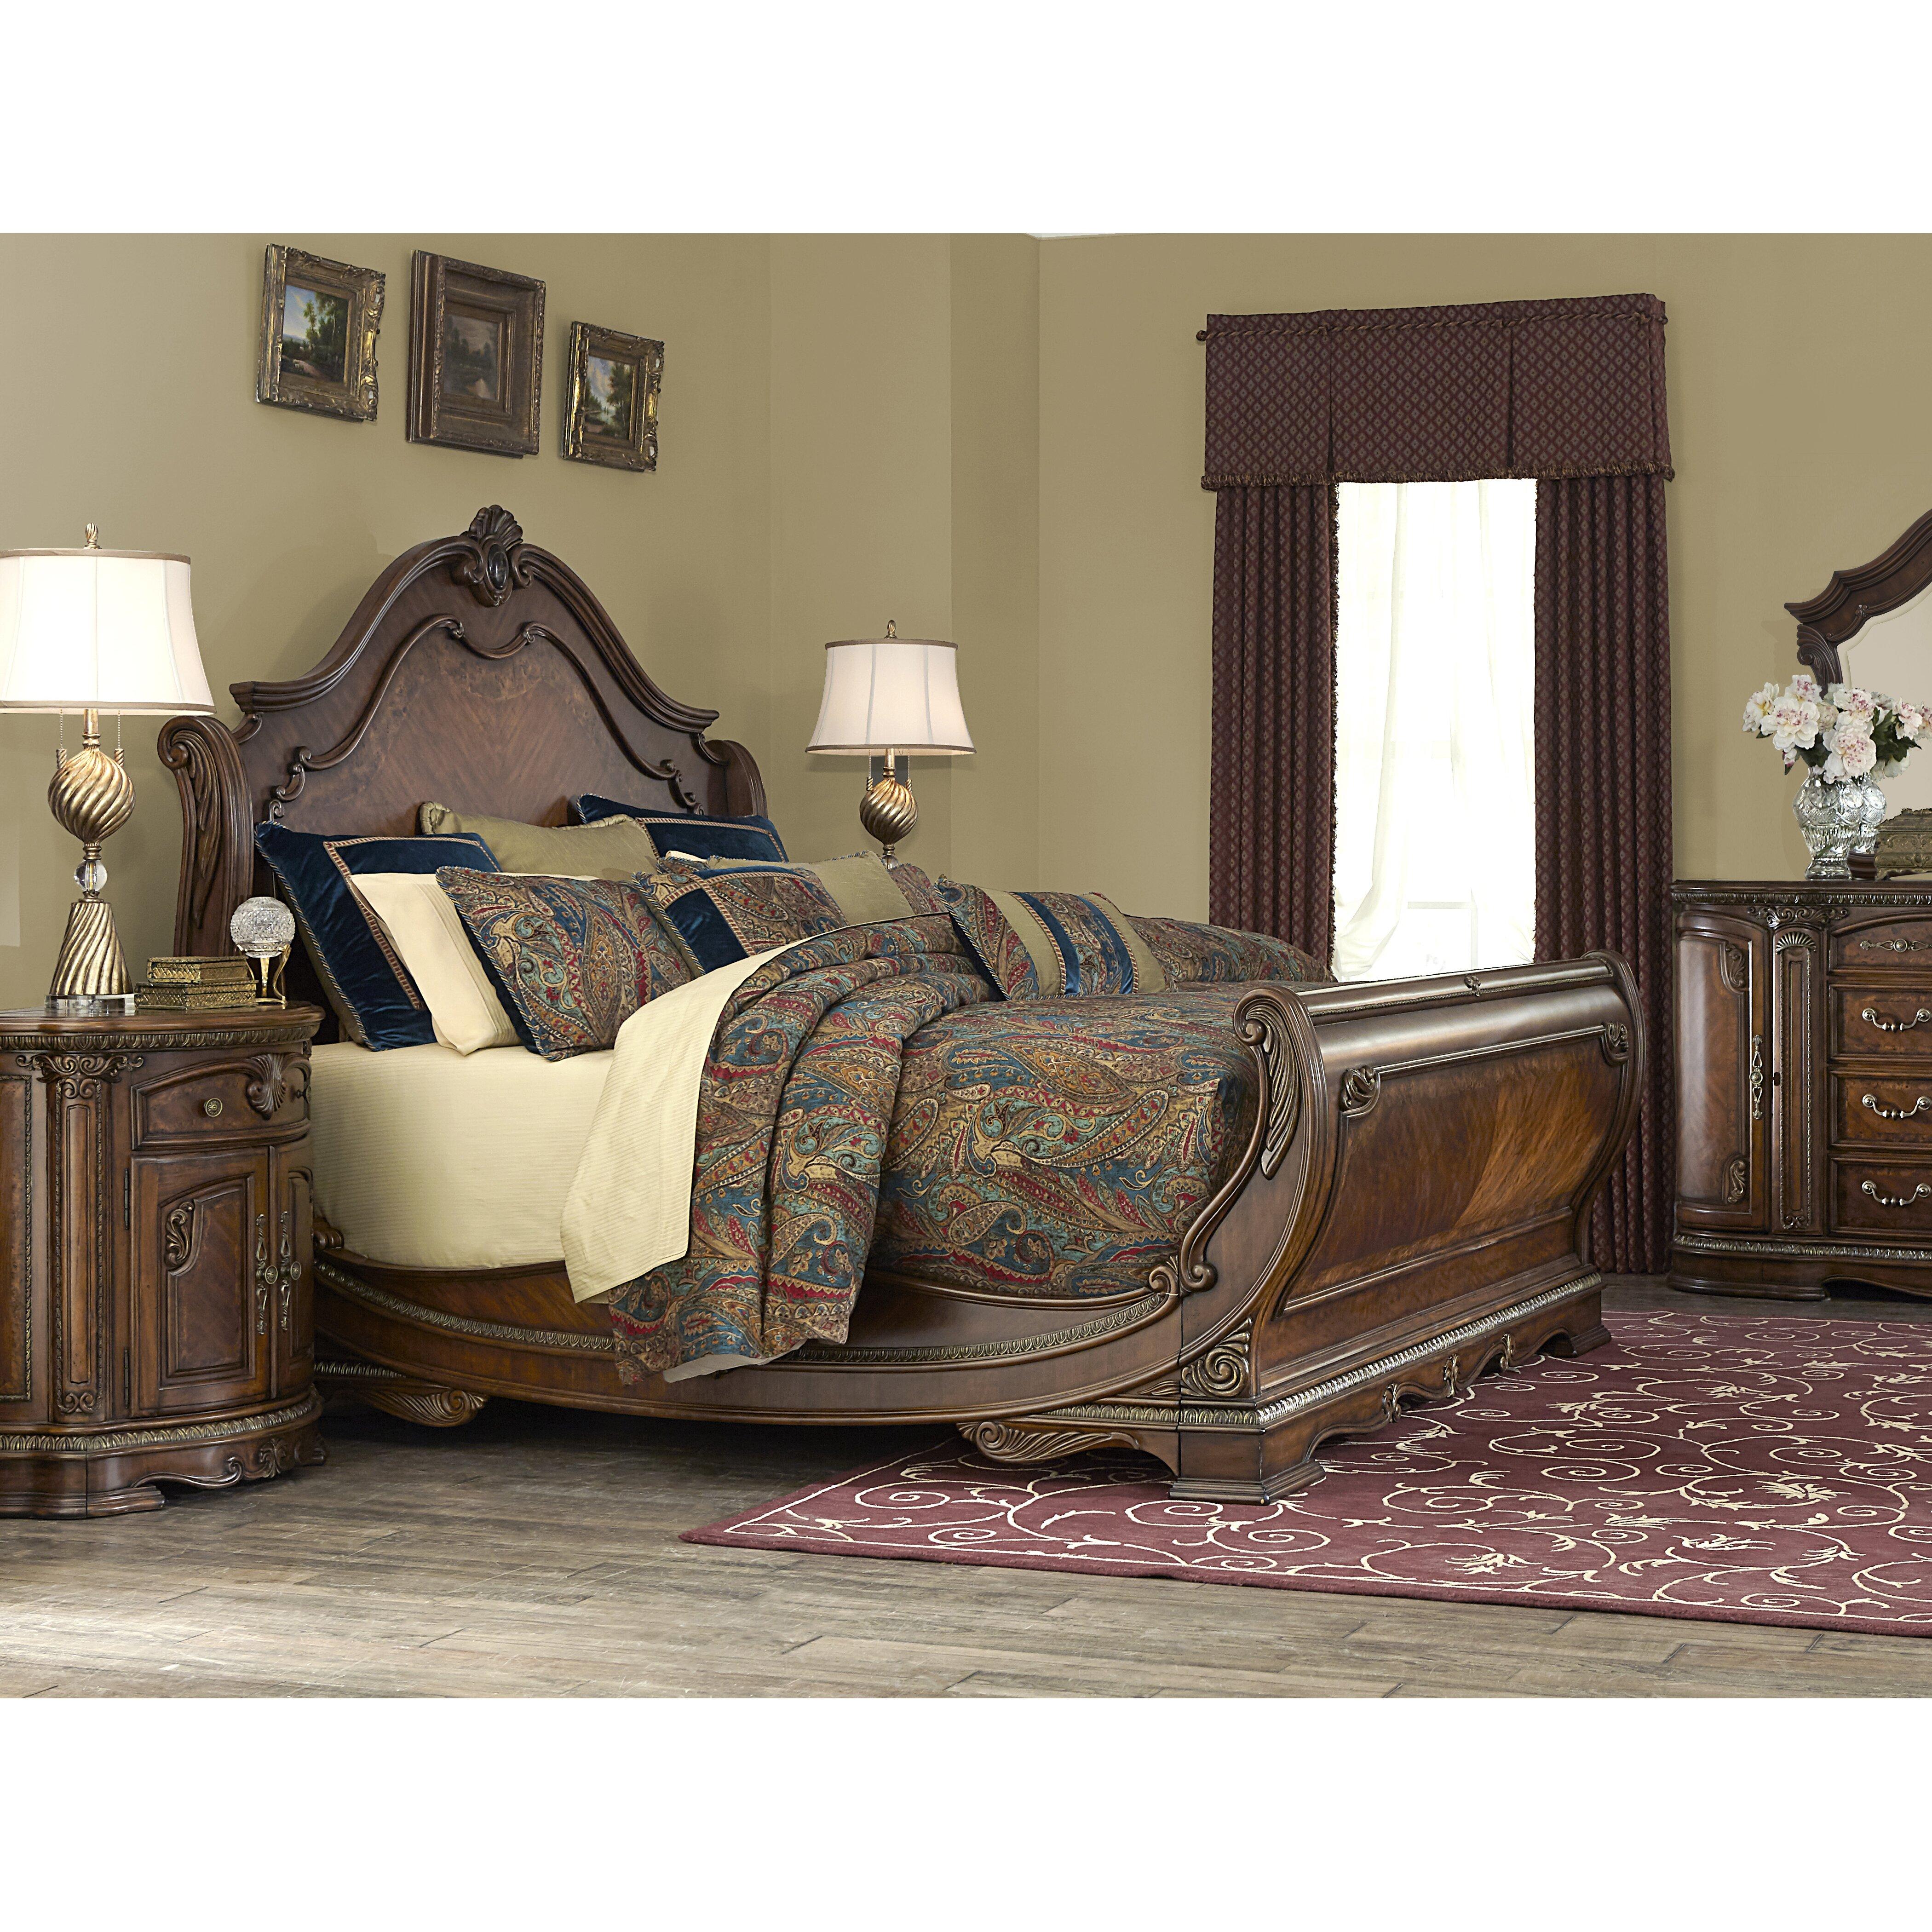 Michael Amini AICO Wayfair - Aico torino bedroom set